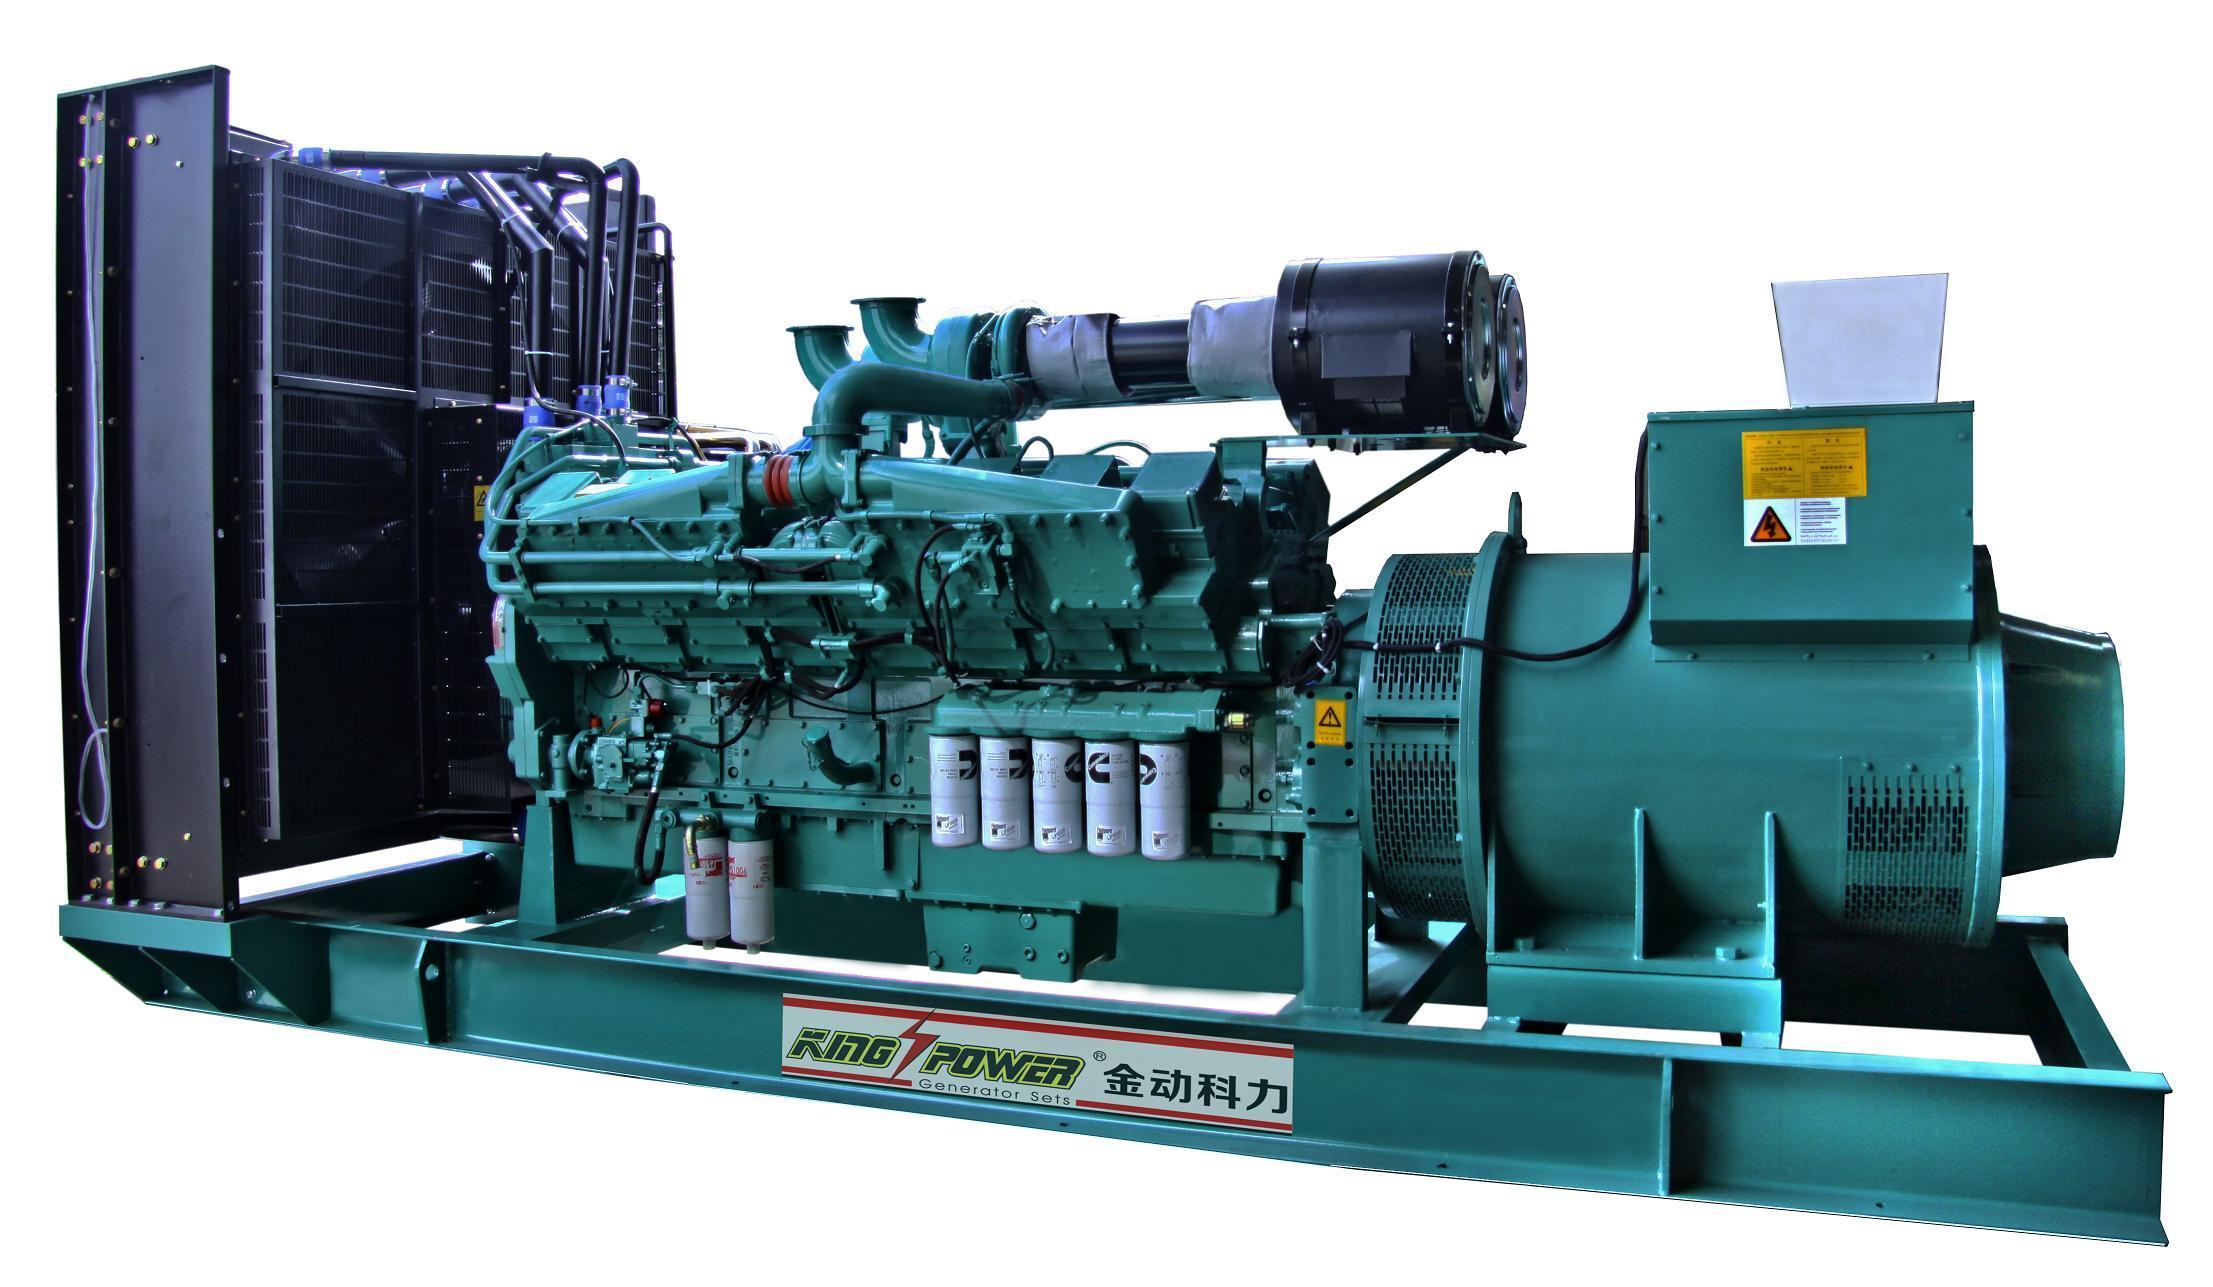 [Hot Item] 1200kw/1500kVA Open/Silent Type Diesel Generator Set with  Robot/Stamford Alternator